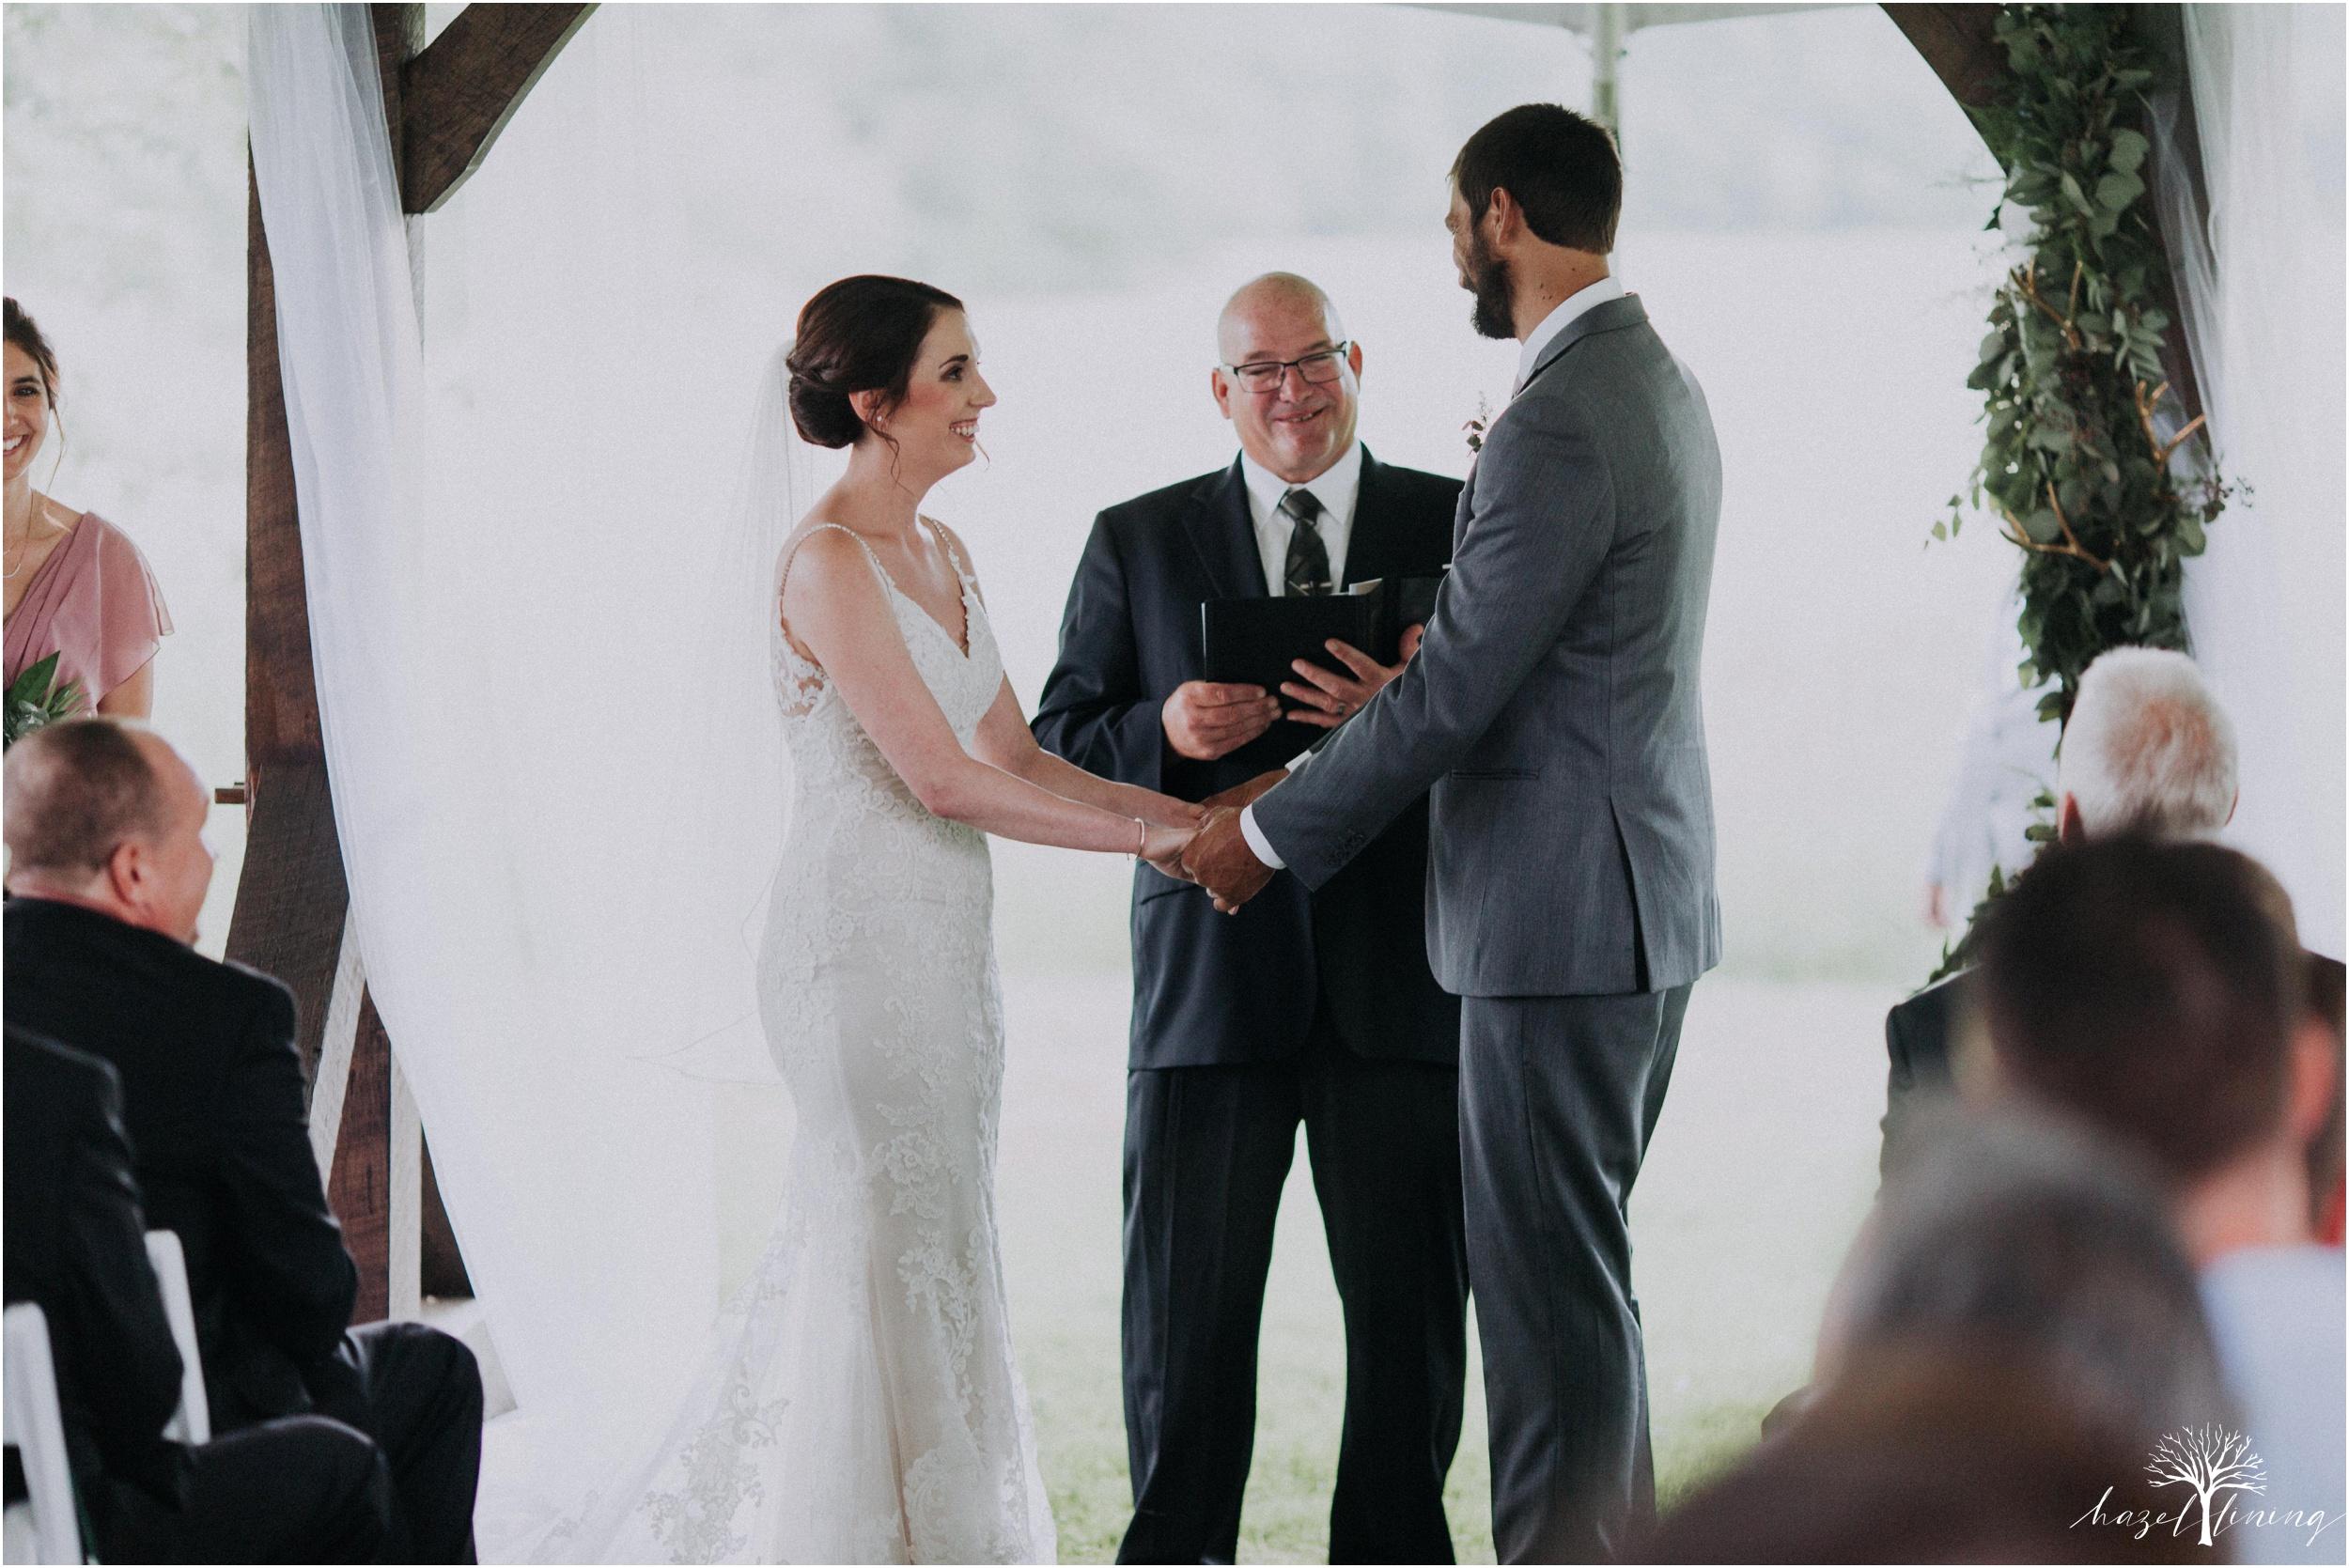 hazel-lining-travel-wedding-elopement-photography-lisa-landon-shoemaker-the-farm-bakery-and-events-bucks-county-quakertown-pennsylvania-summer-country-outdoor-farm-wedding_0059.jpg